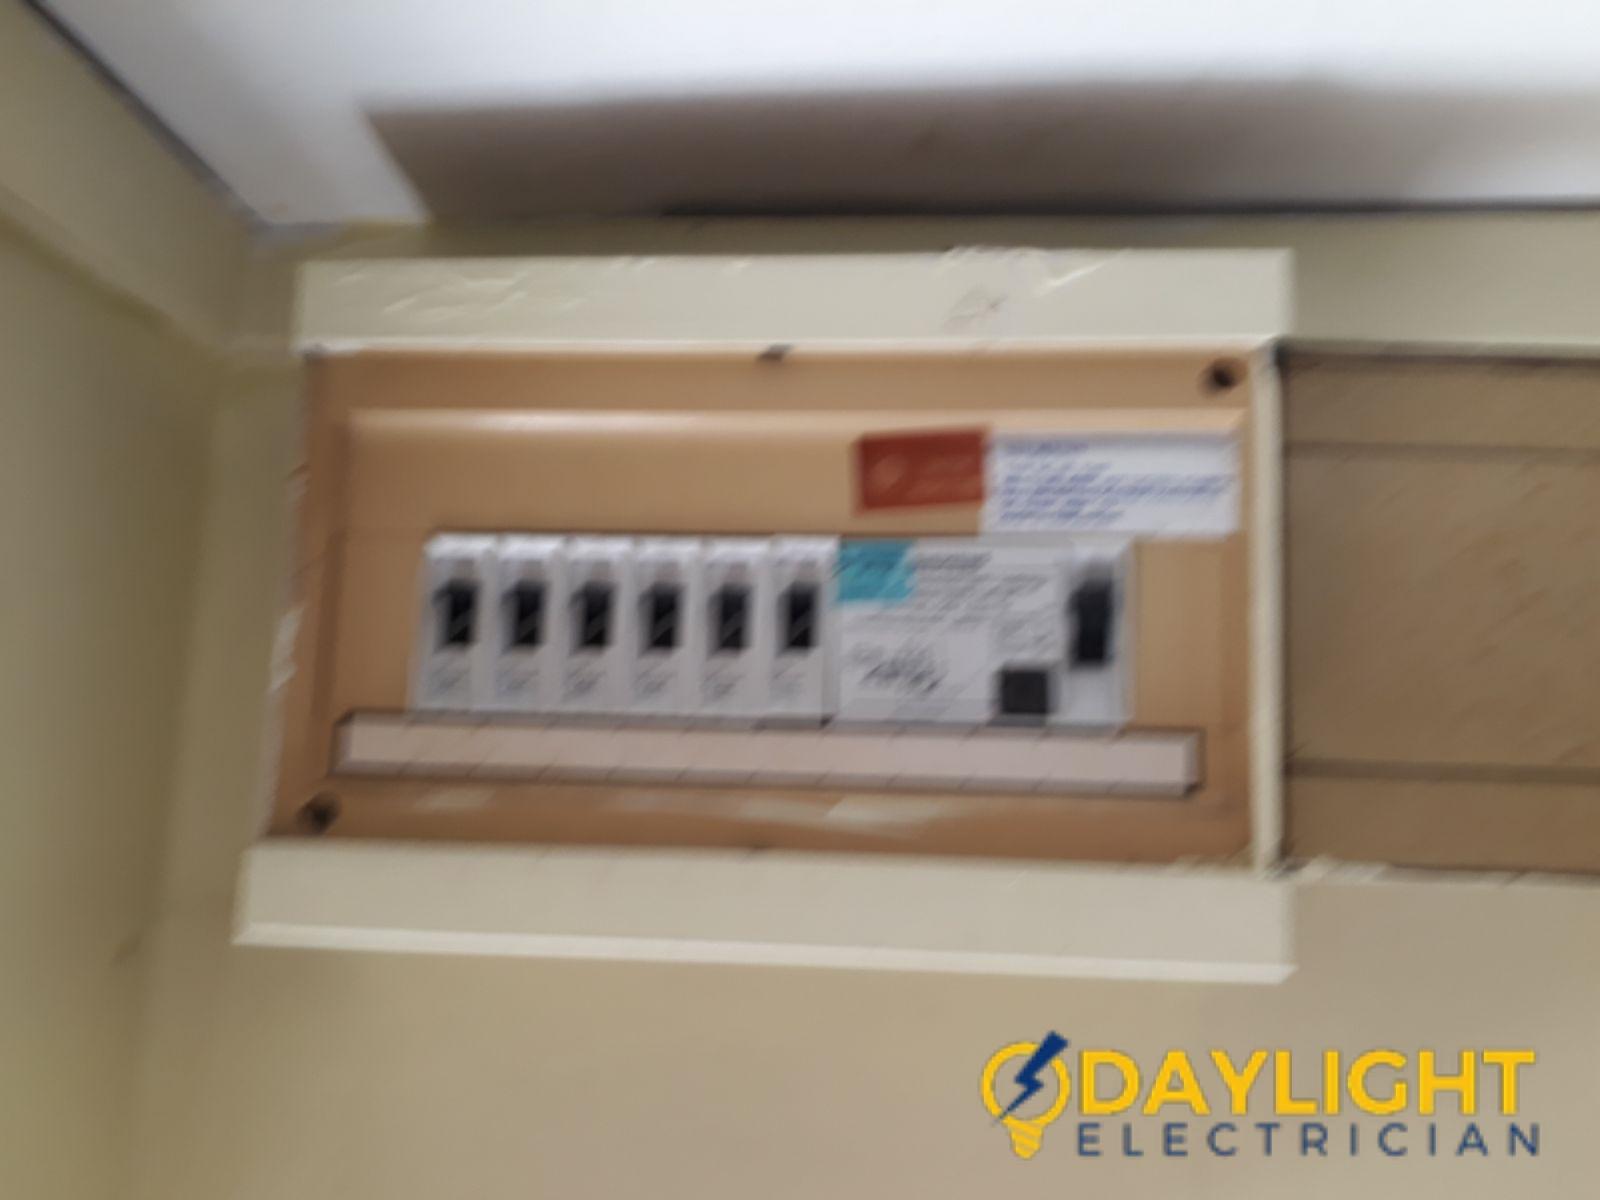 Db-Box-Distribution-Board-Replacement-Electrician-Singapore-HDB-Buona-Vista-1_wm